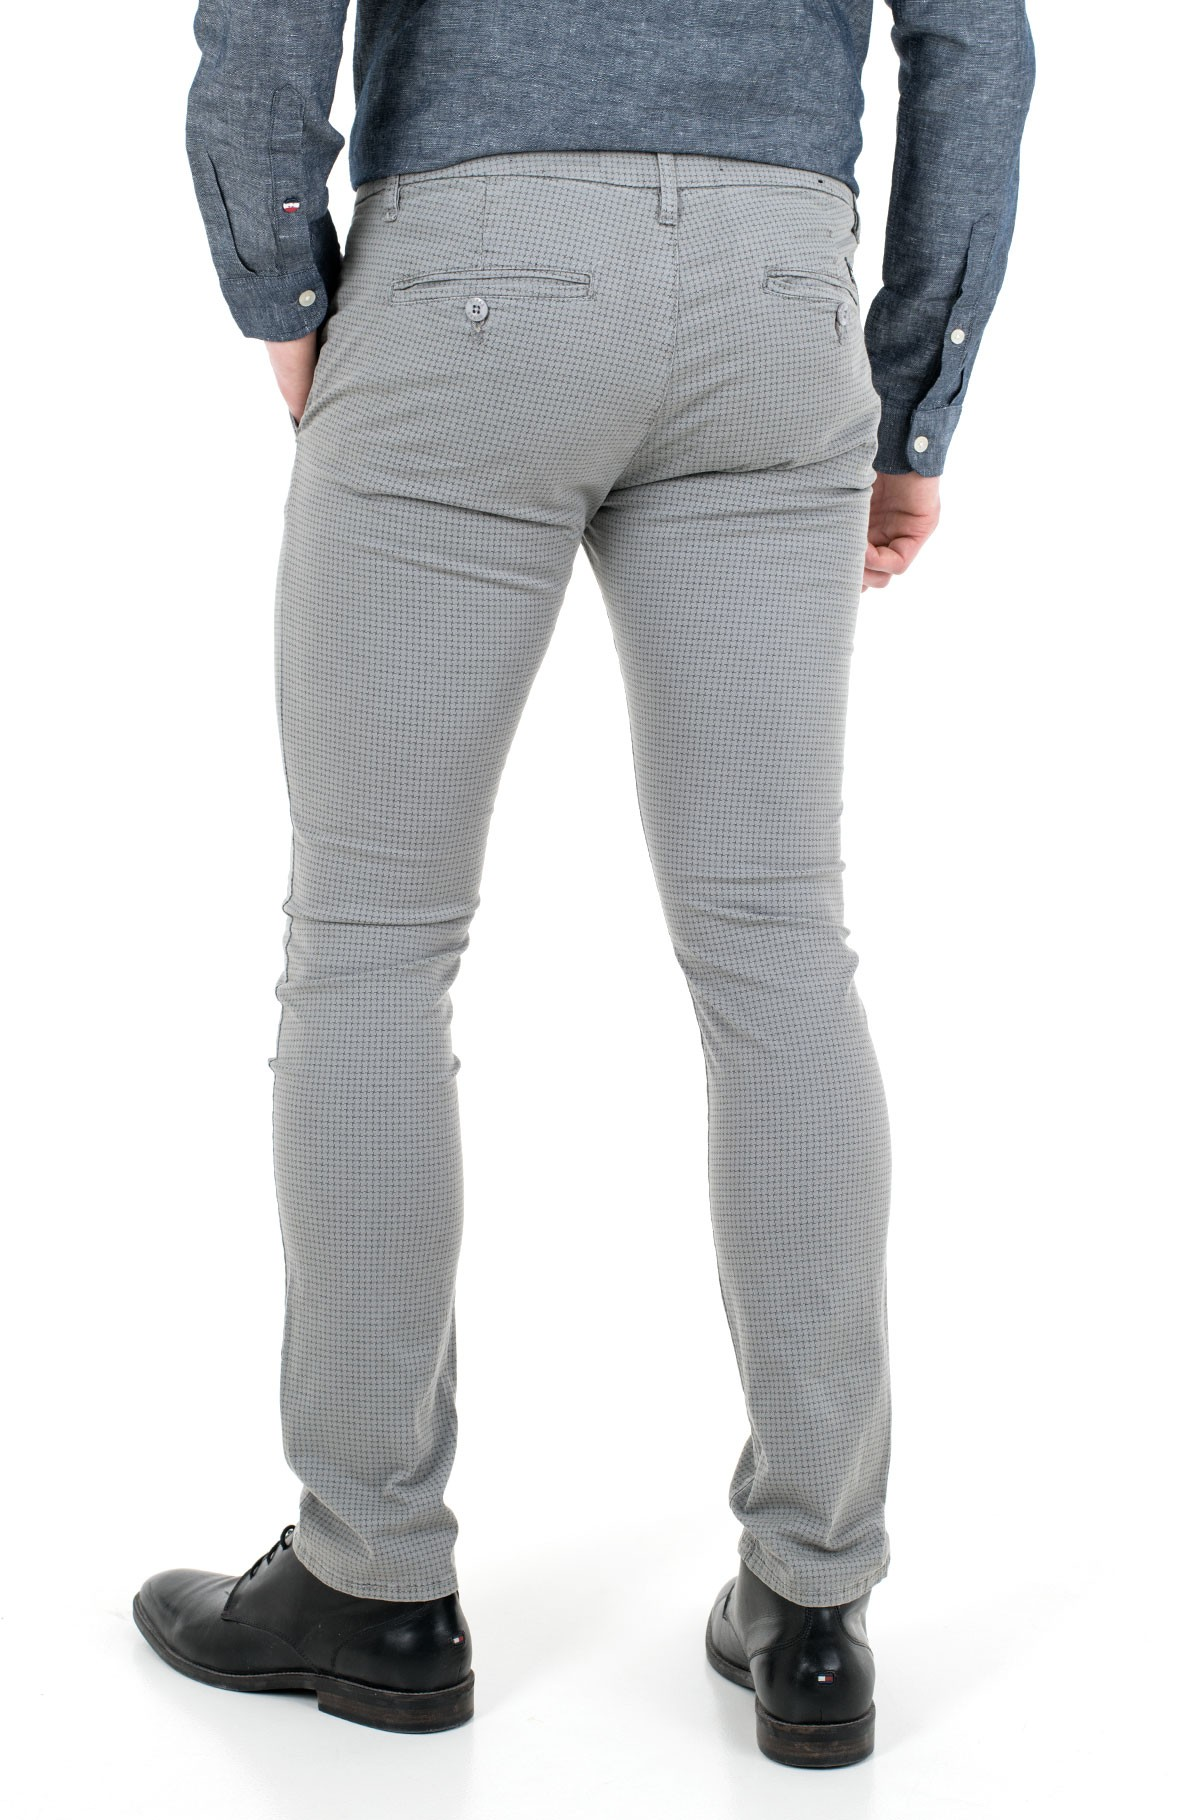 Riidest püksid M1RB29 WCNZ6-full-2